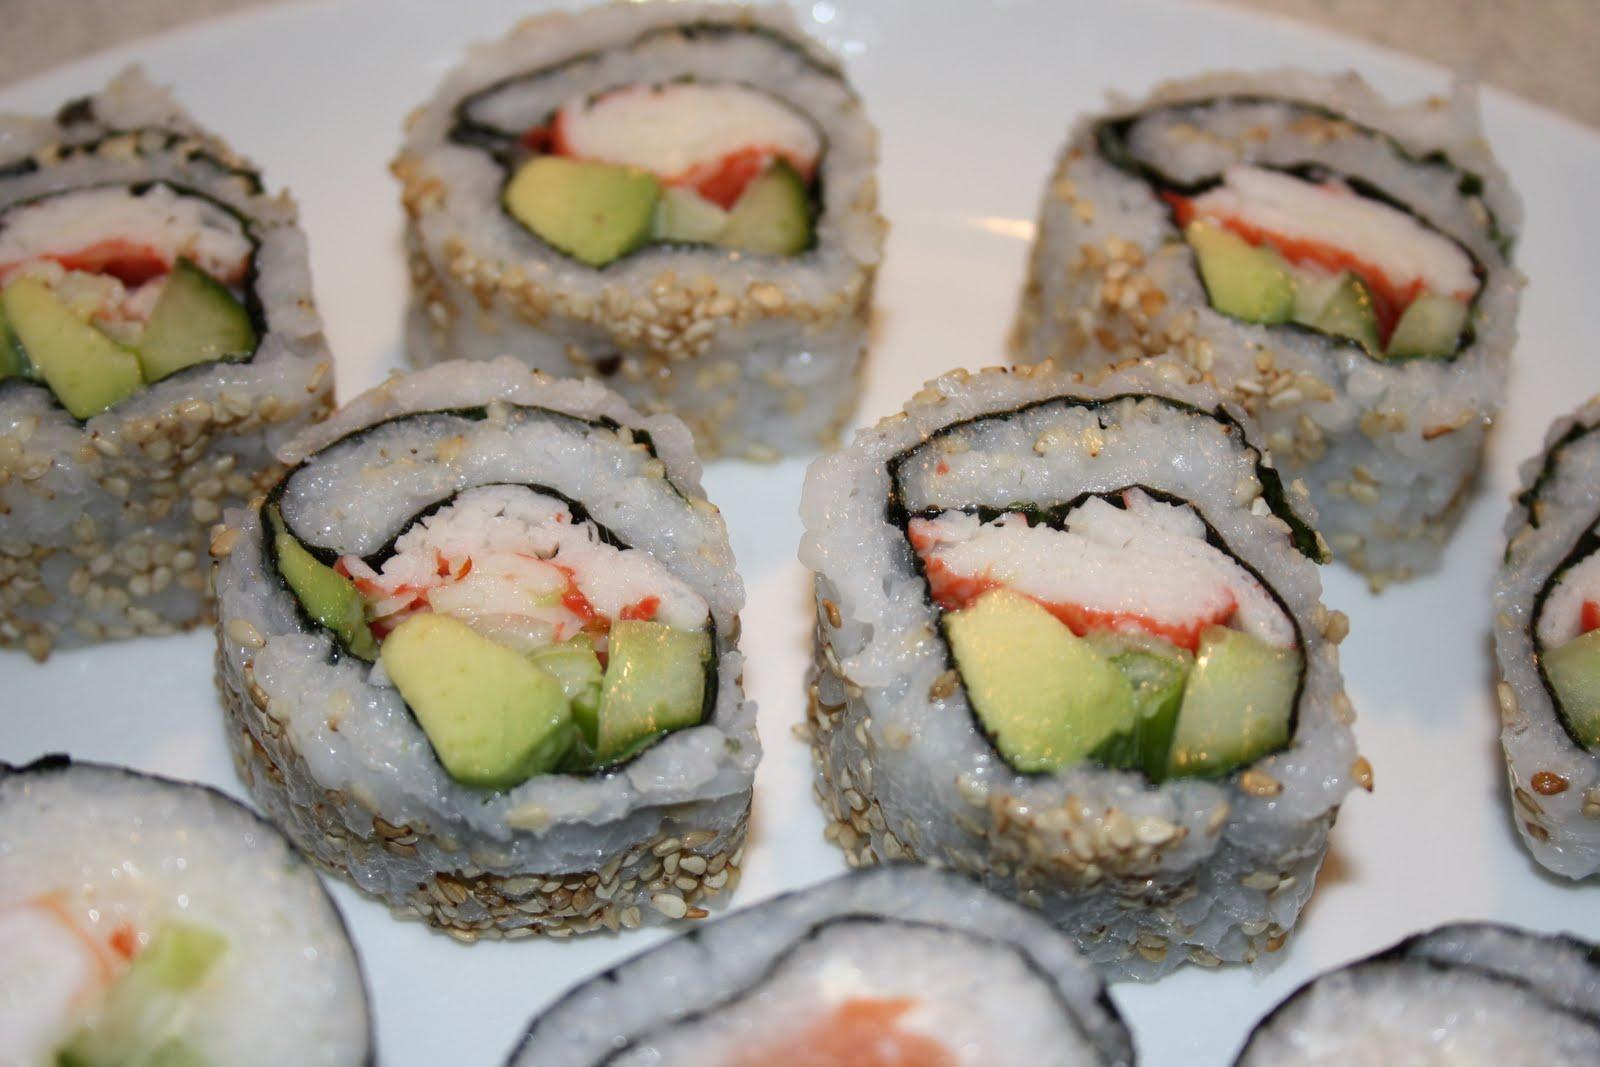 hvordan laver man sushi